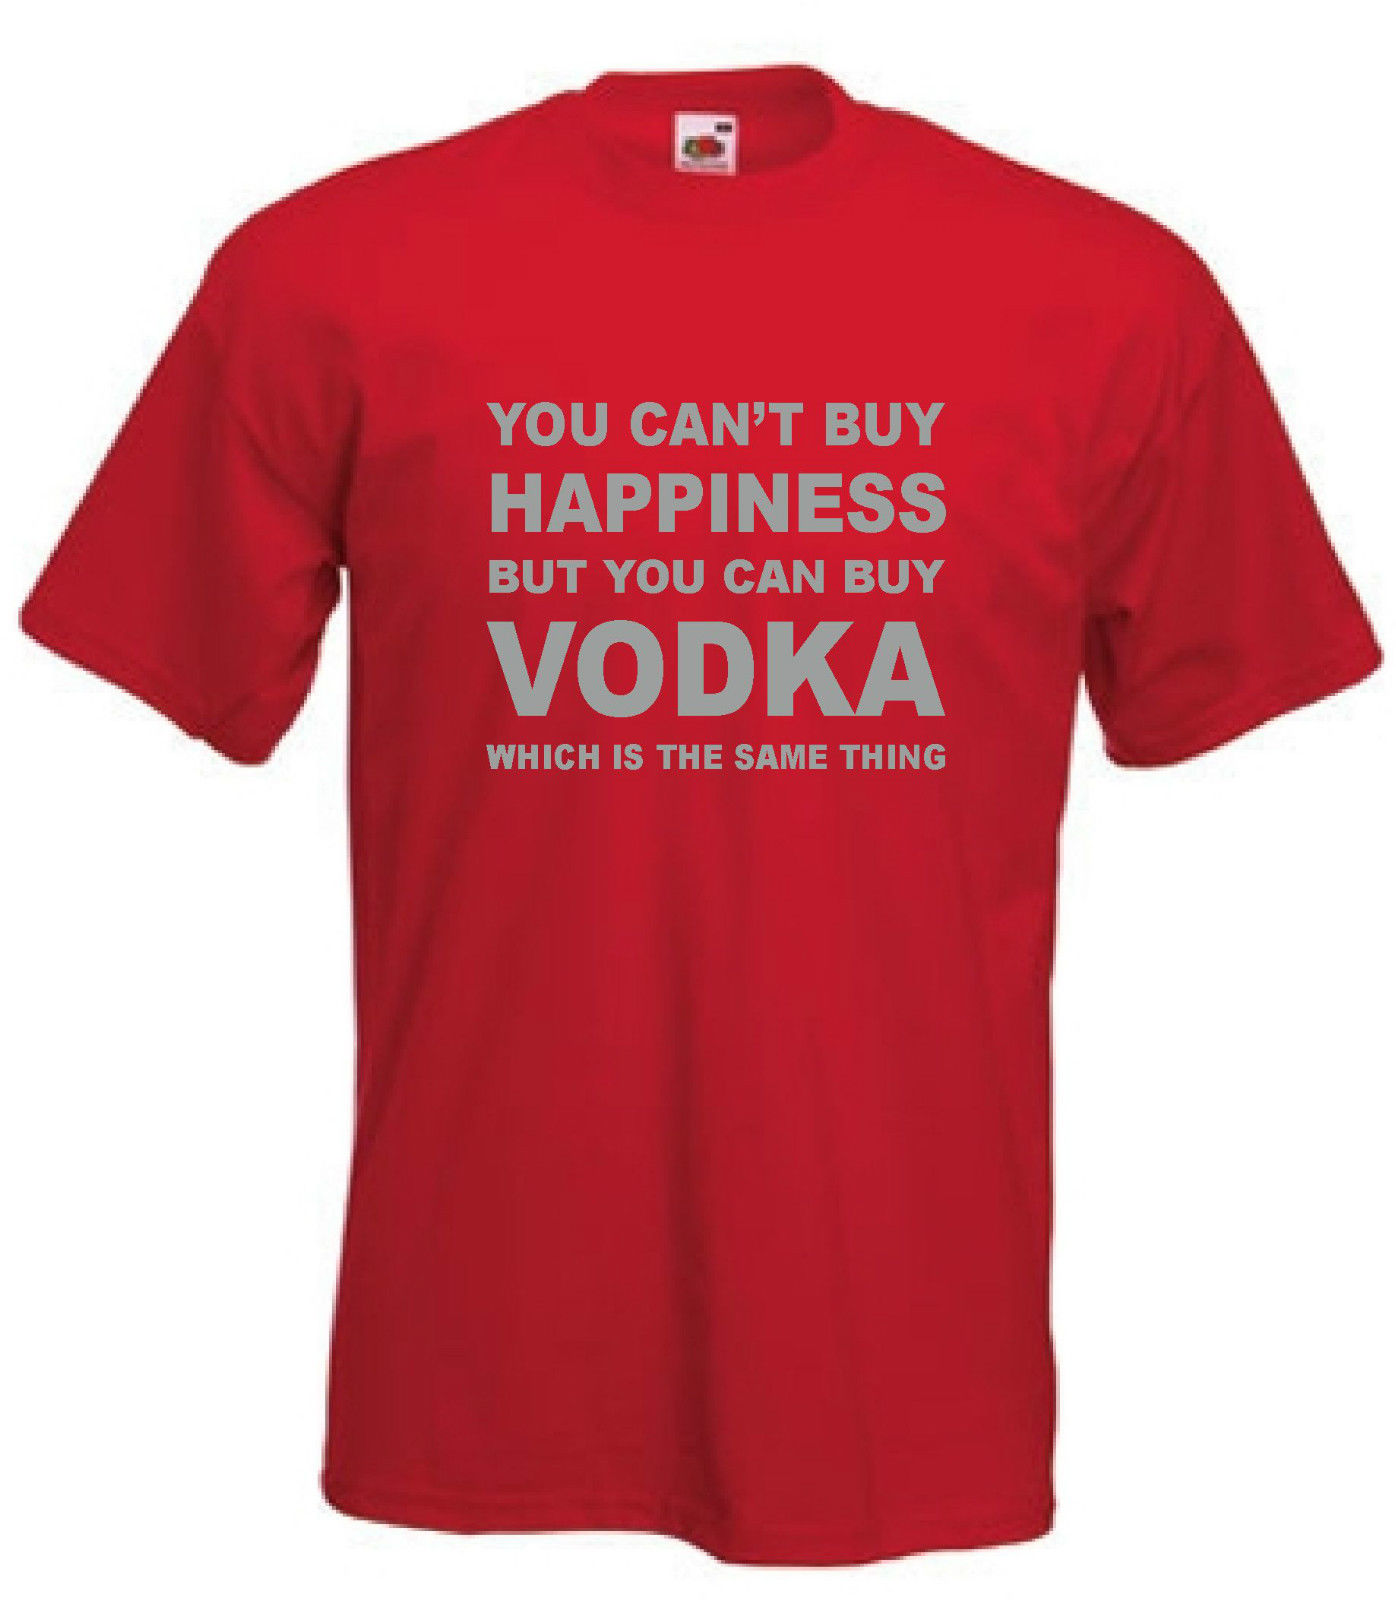 Vodka T Shirt Funny Alcohol TShirt Drinking T Shirt Drunk Sizes S XXXL in T Shirts from Men 39 s Clothing